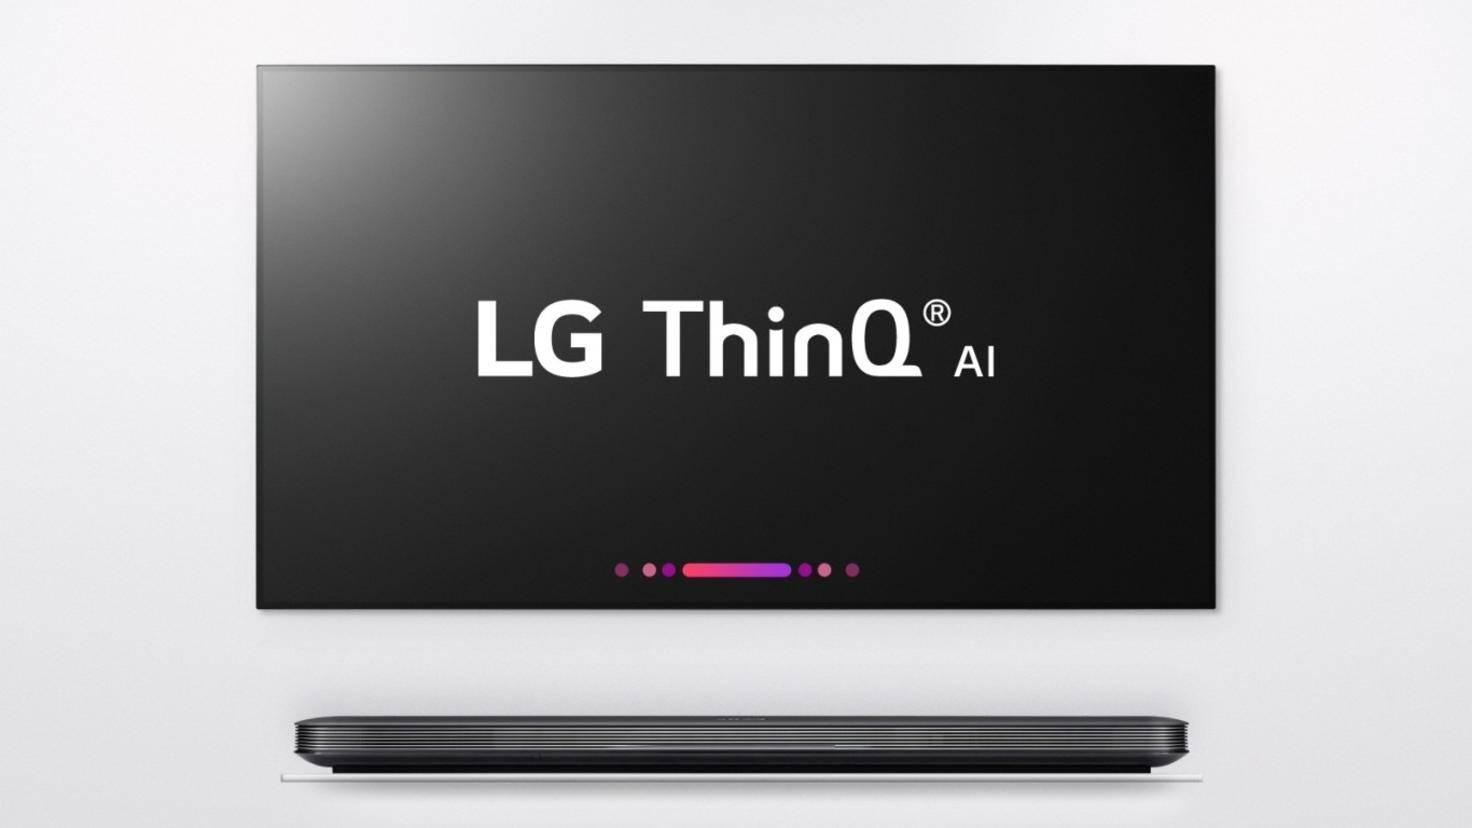 LG-W8-ThinQ-AI